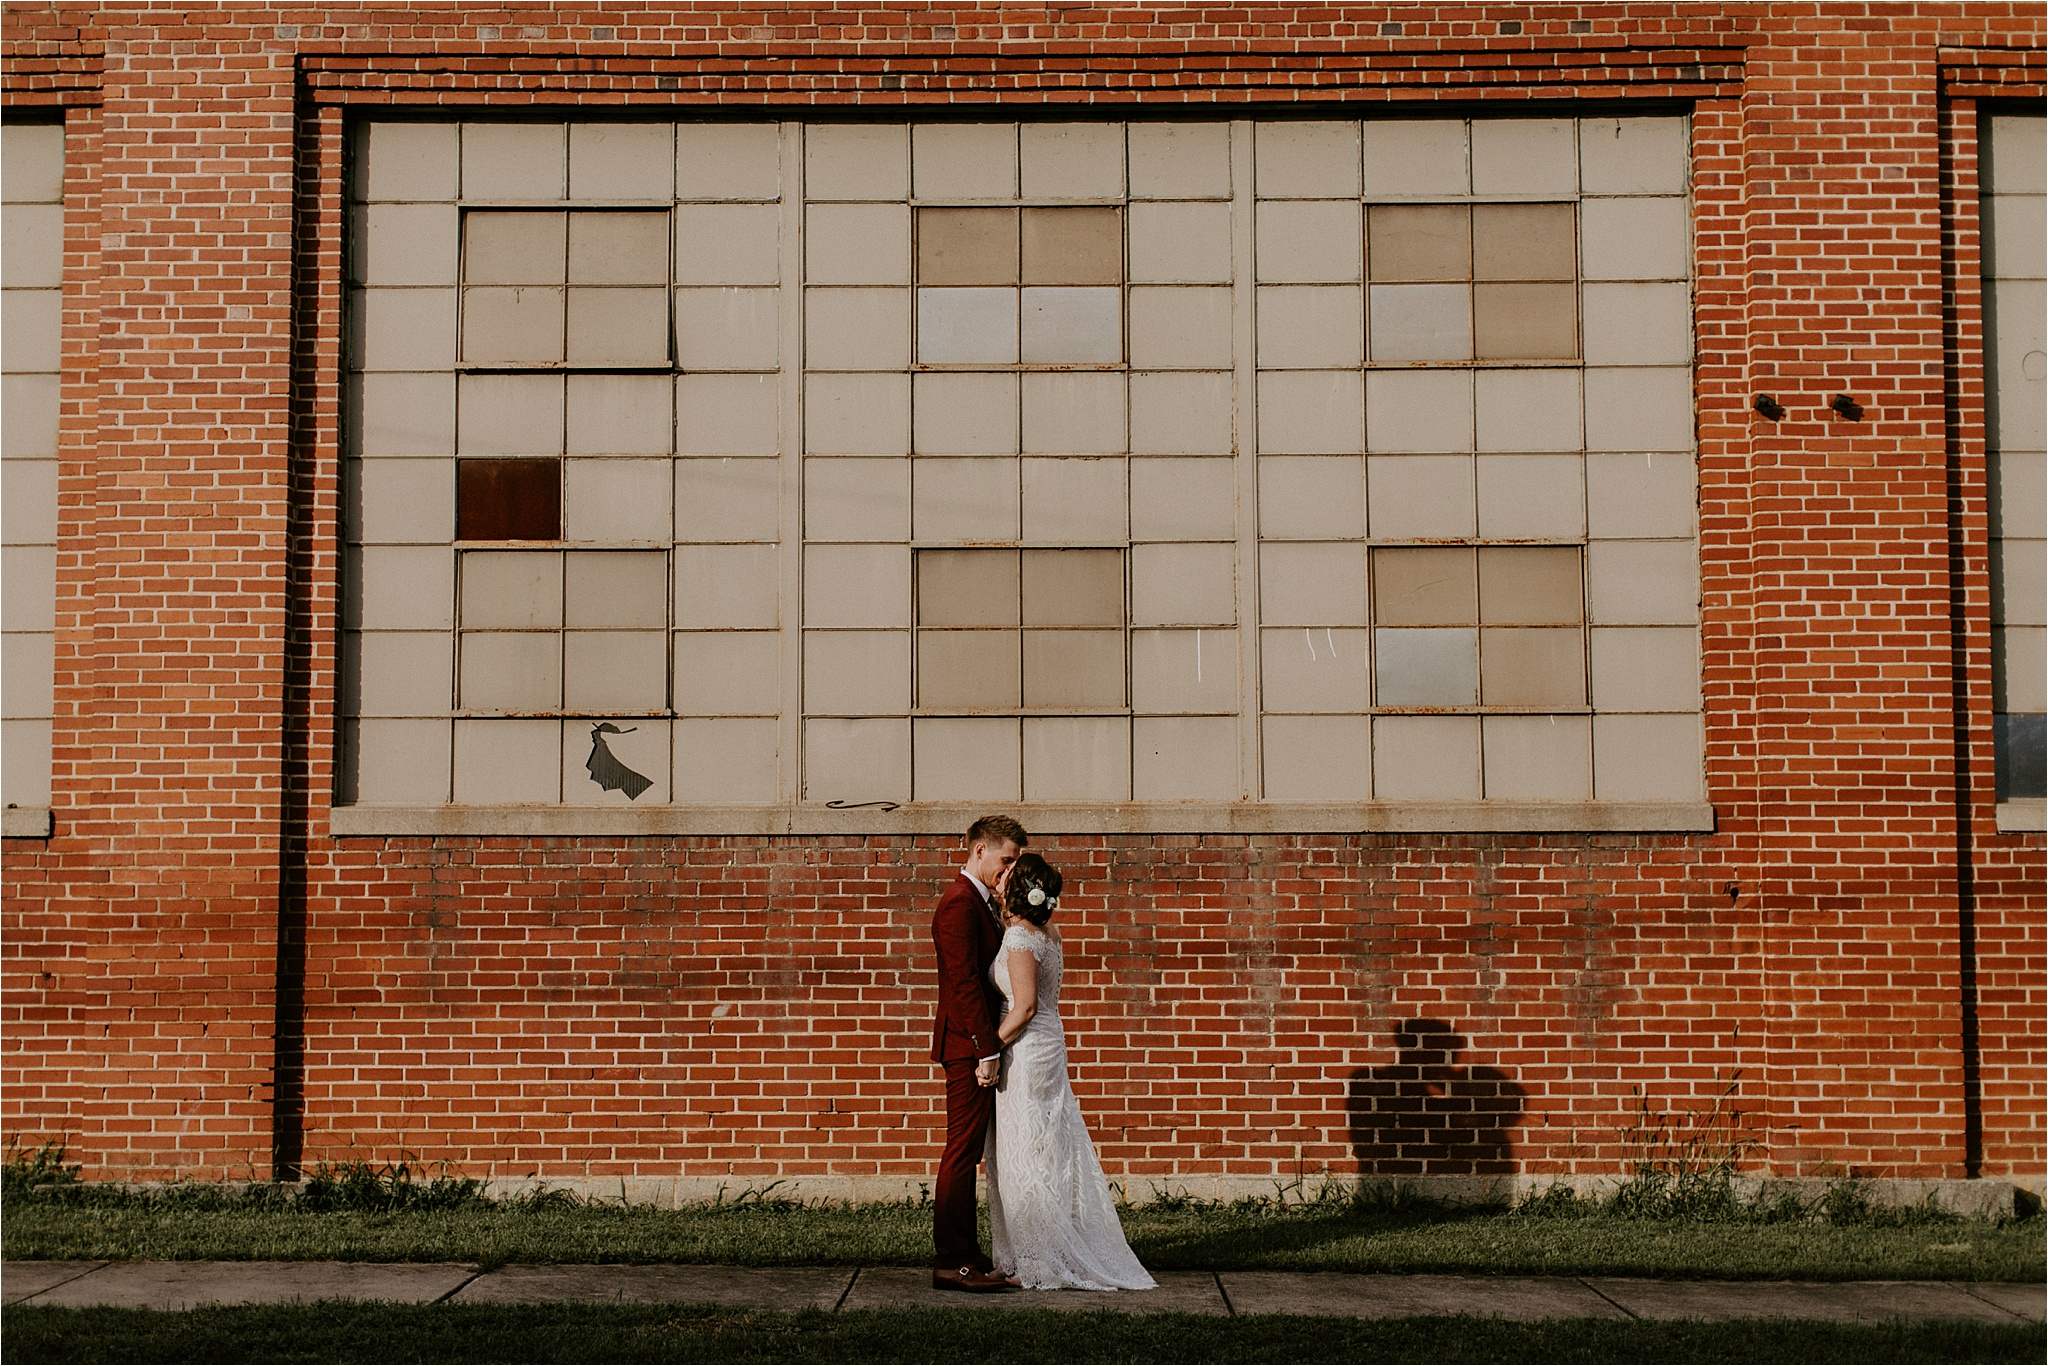 Renee_+_Dustin_-_Supply_Wedding-_0112.jpg